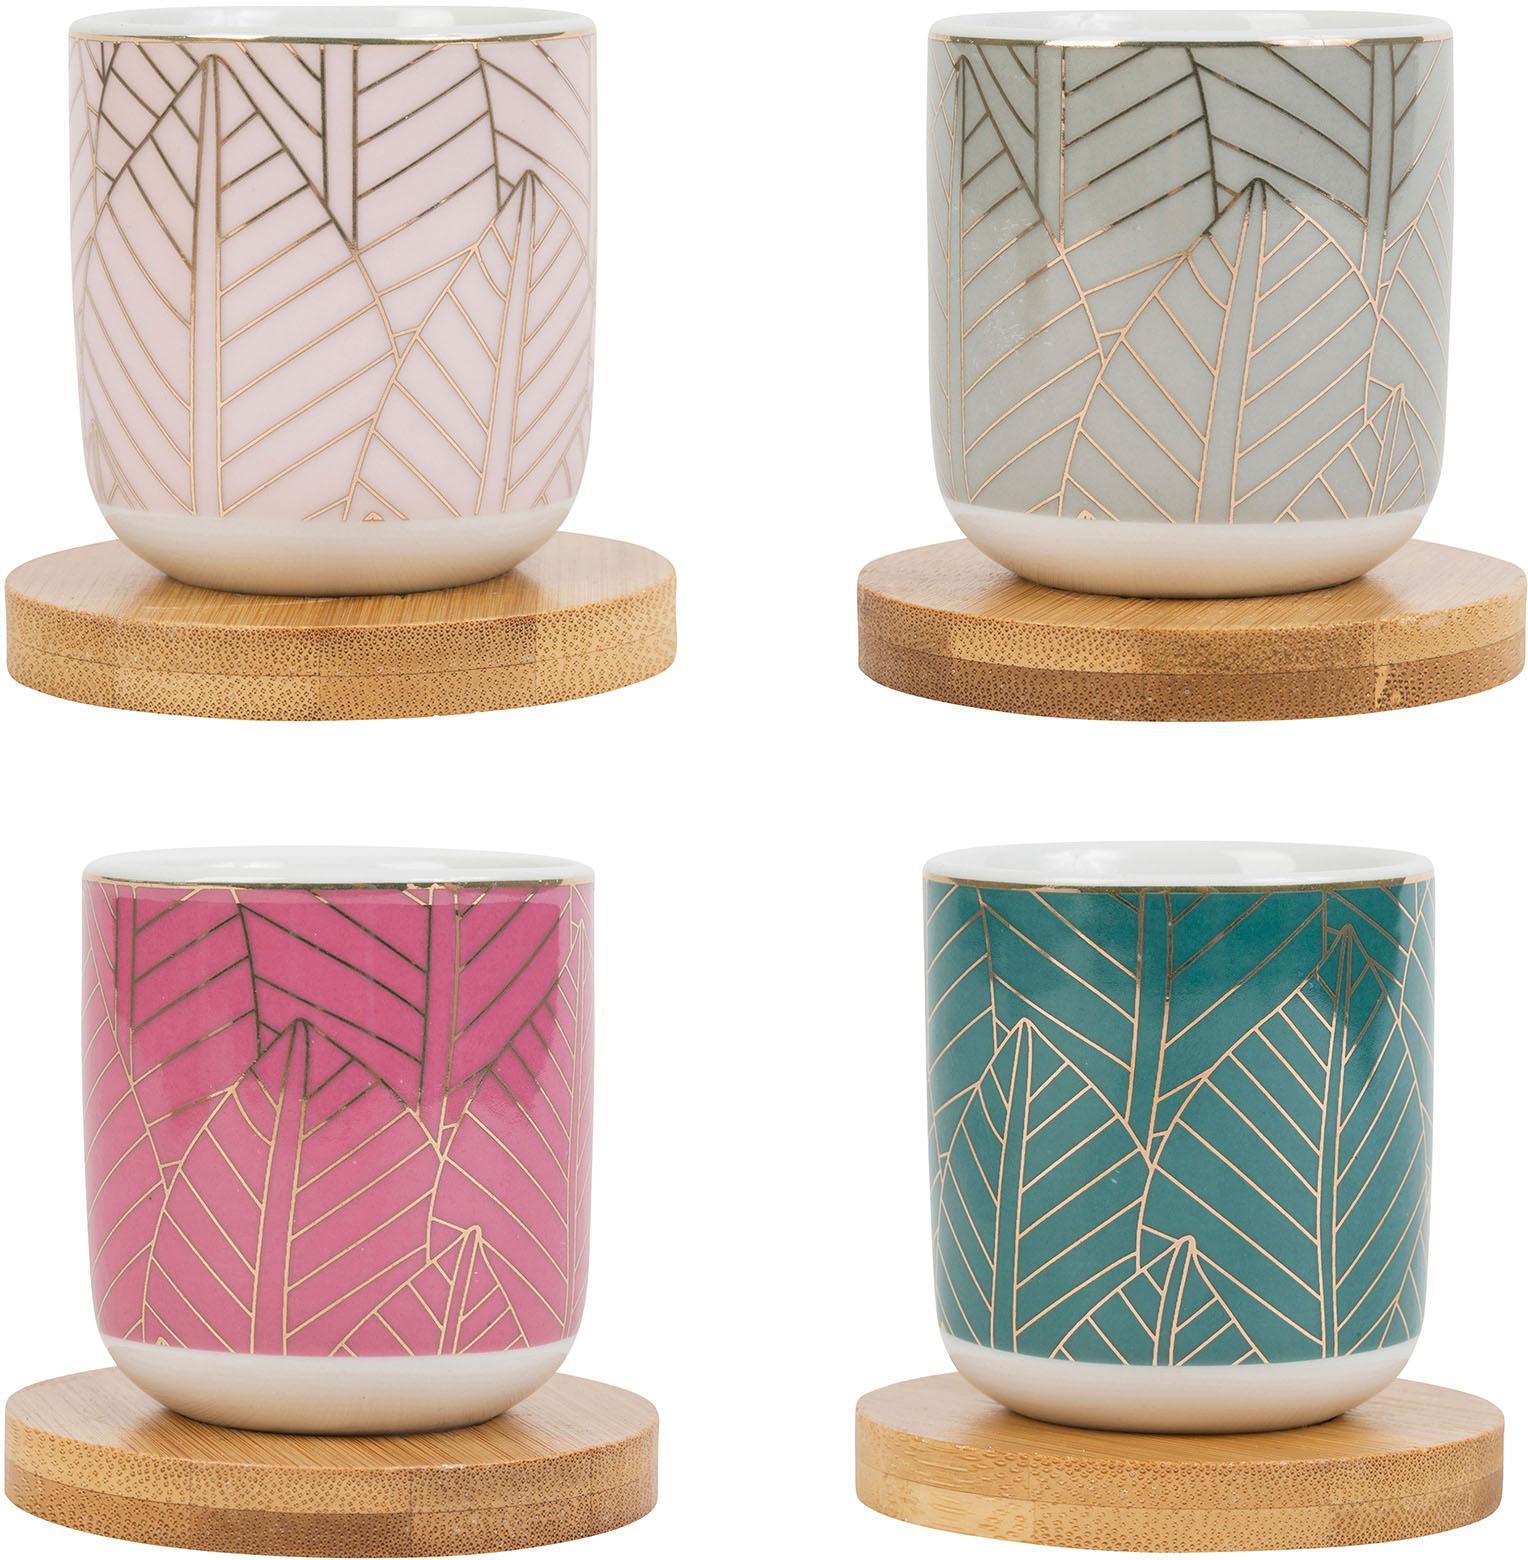 Set tazze senza manico Orfe 8 pz, Multicolore, Ø 6 x Alt. 7 cm